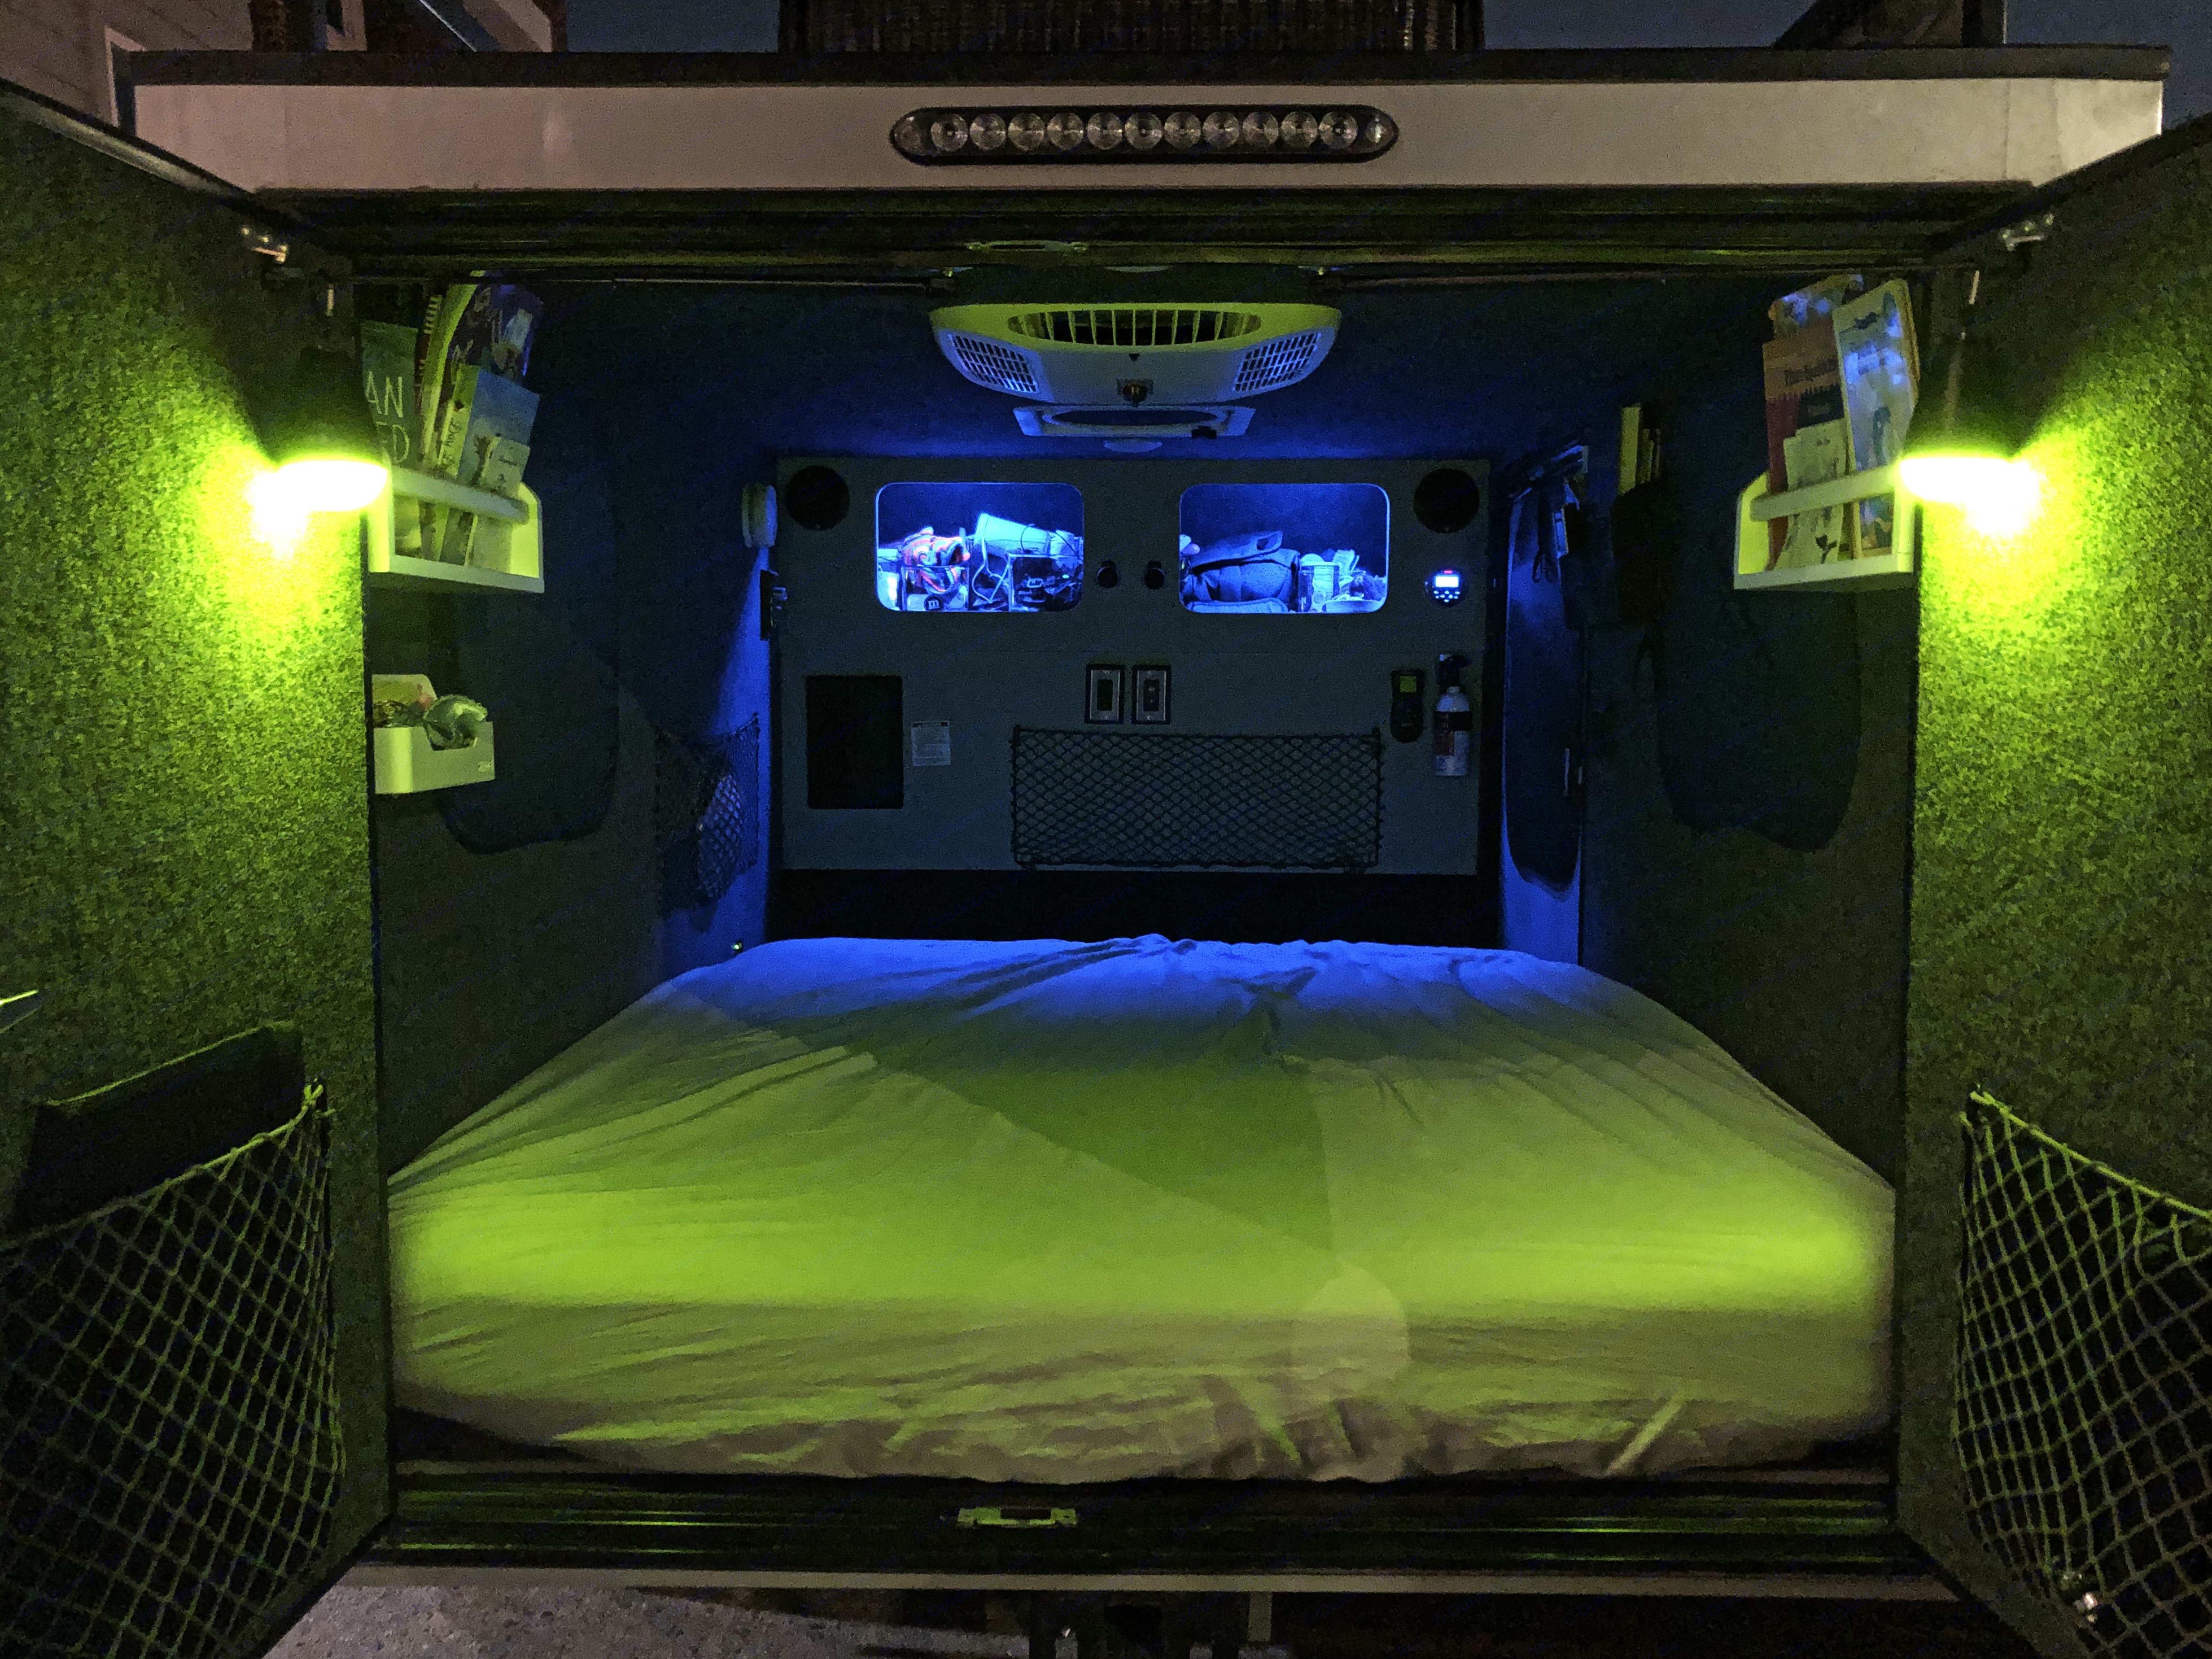 Night lights mode. InTech RV Flyer Pursue 2018